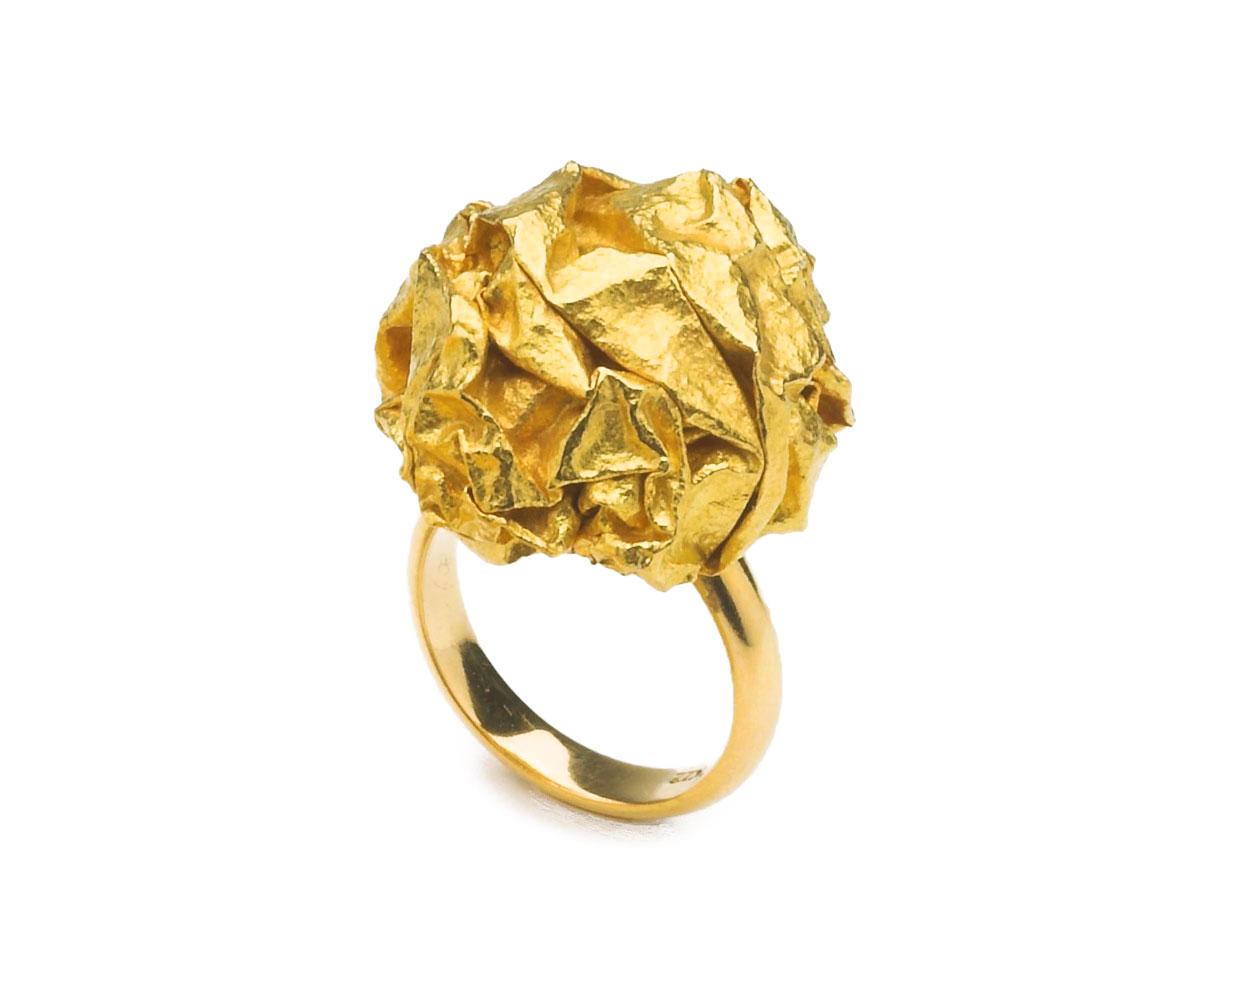 © Gold Ring by Yasuki Hiramatsu